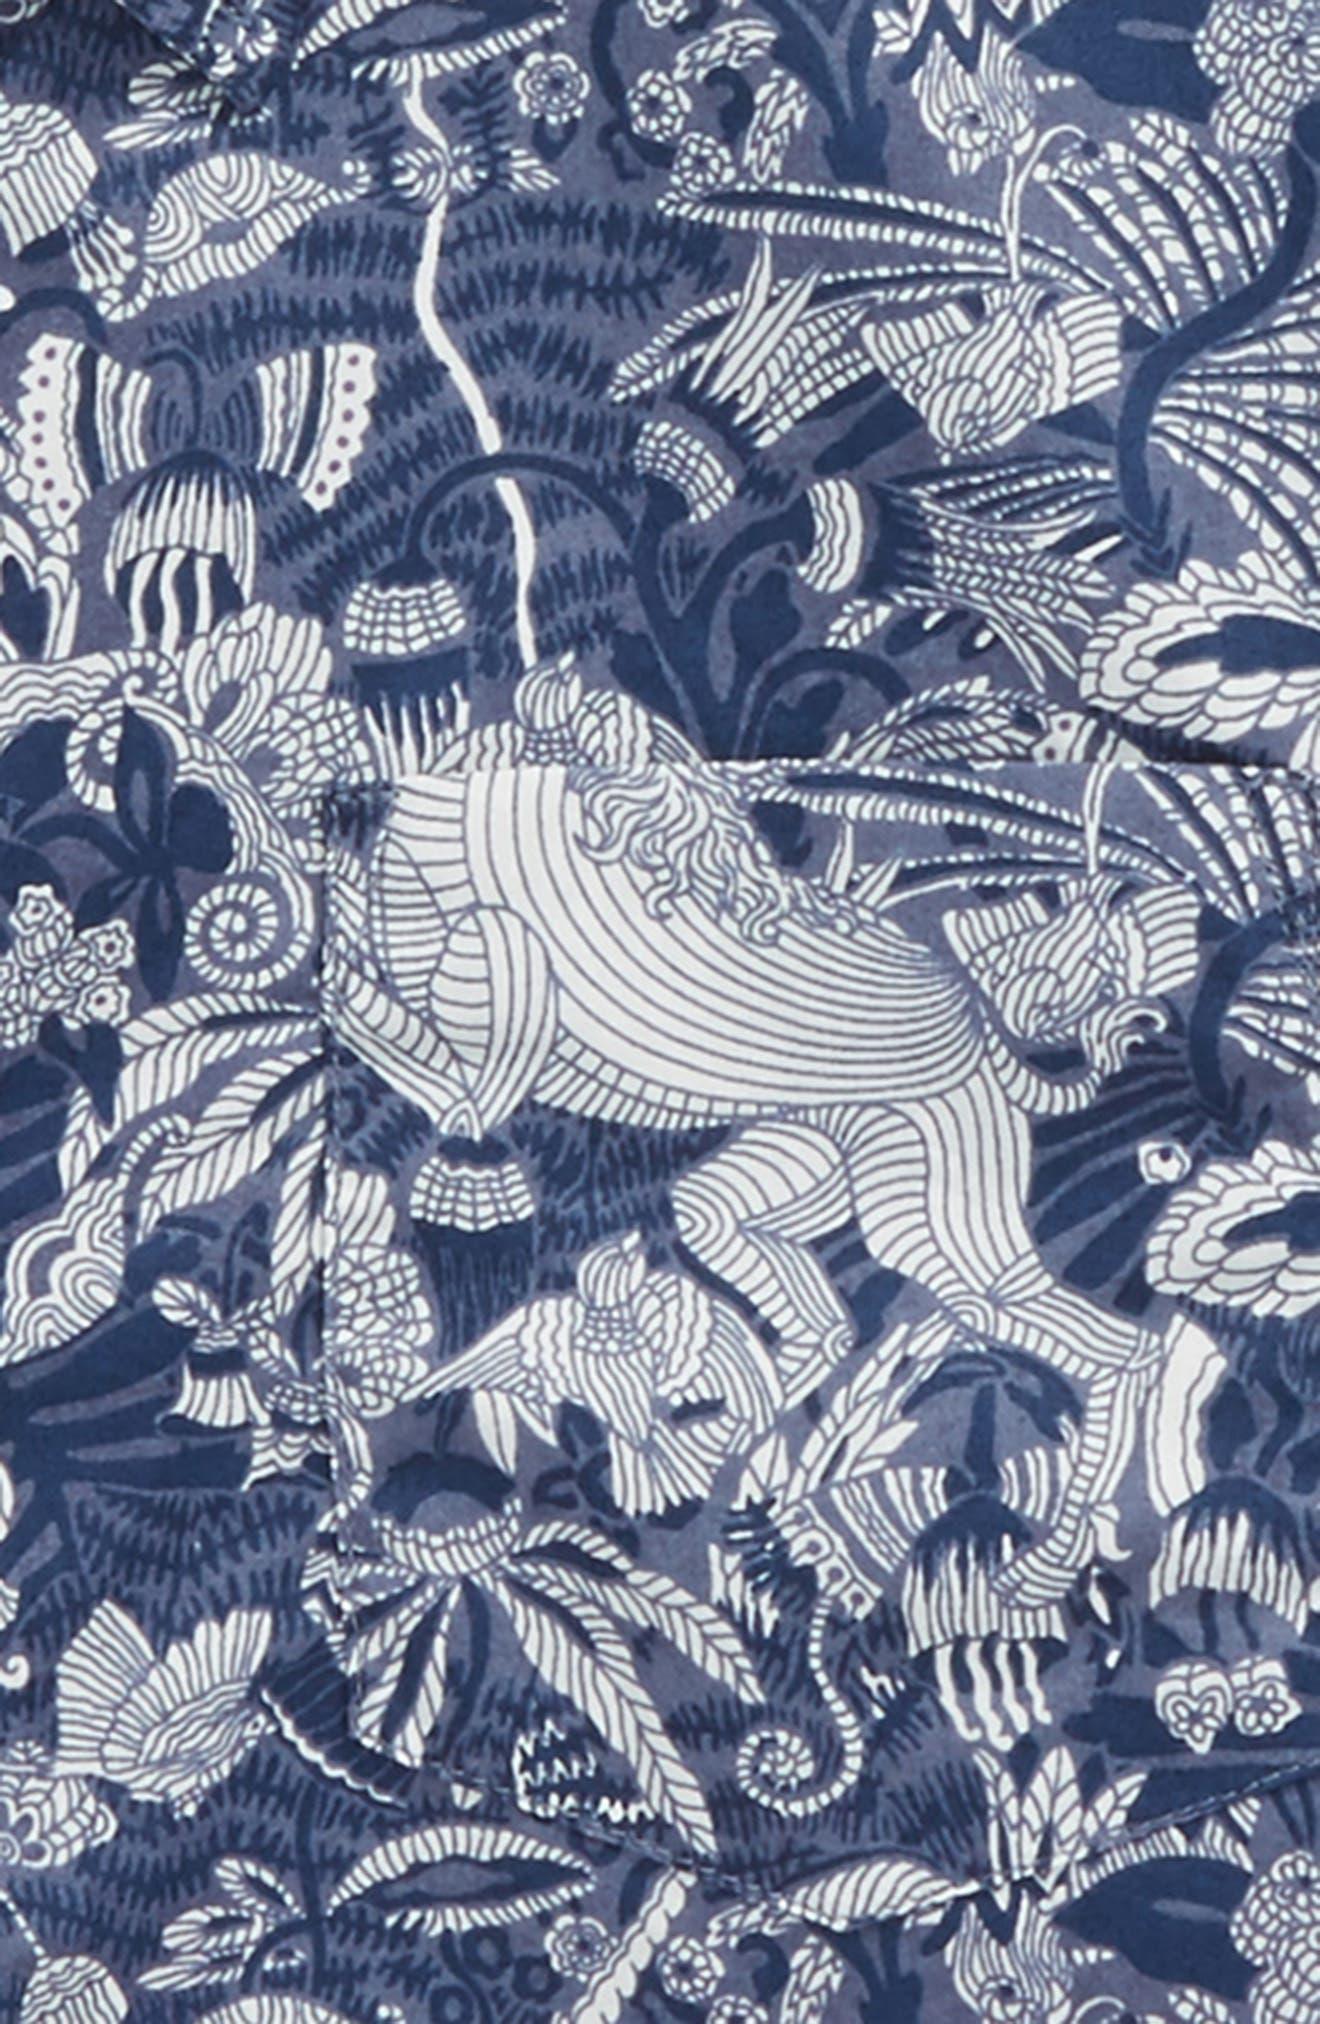 Jungle Unicorn Print Woven Shirt,                             Alternate thumbnail 2, color,                             Midnight Unicorn